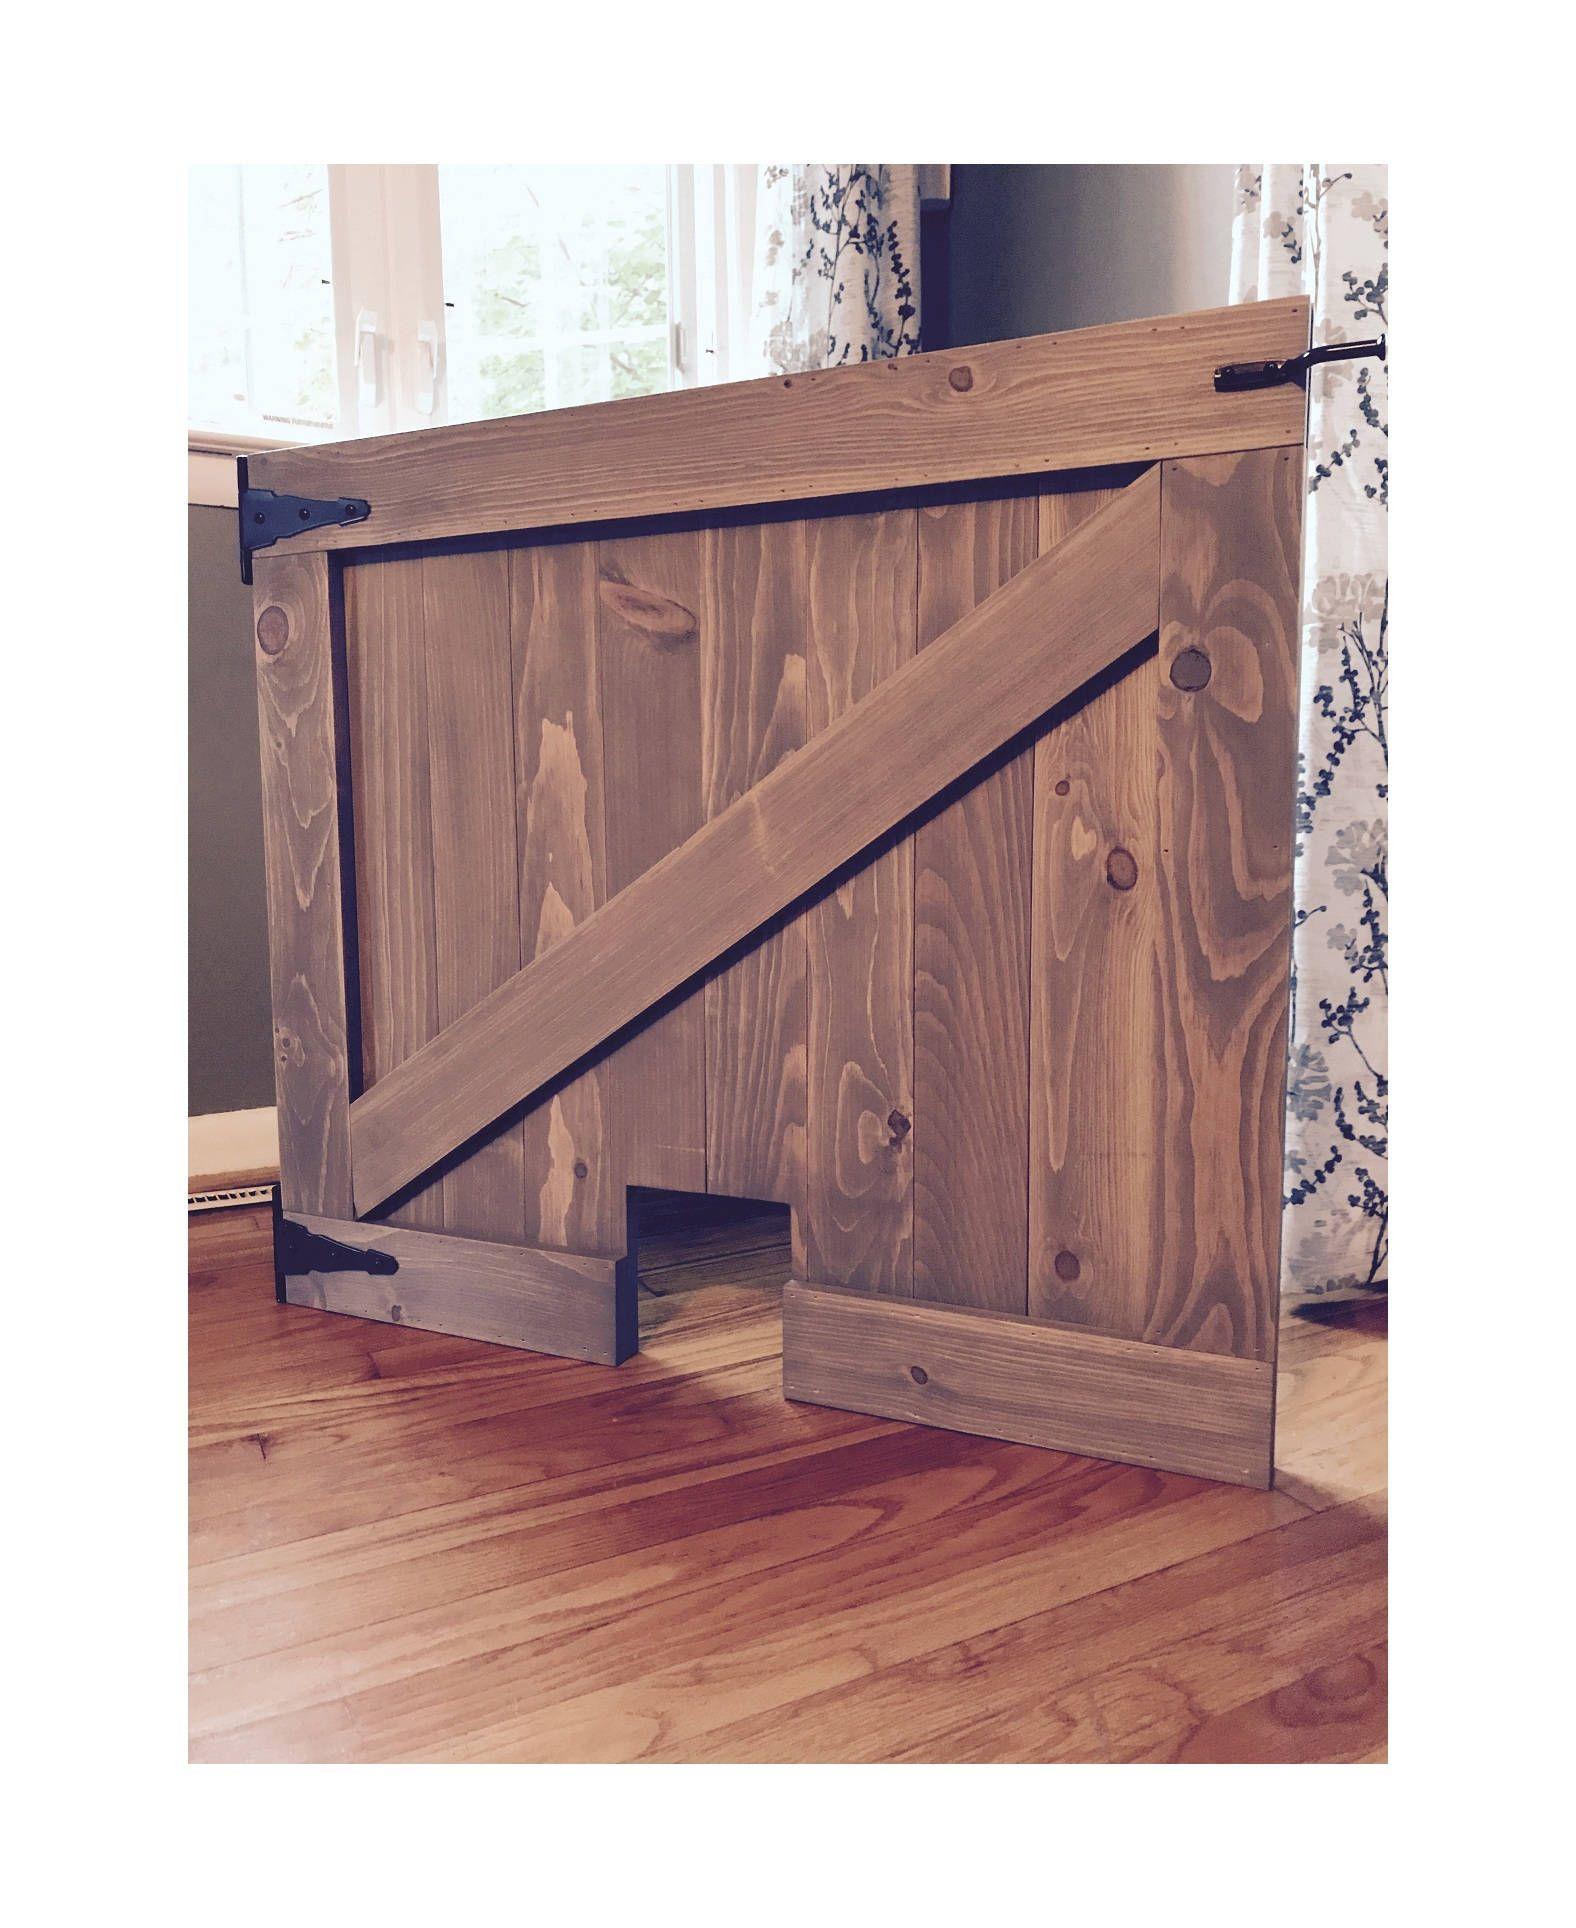 Pet Security Gate Barn Door Baby Gate Custom Dog Gate Etsy Barn Door Baby Gate Baby Gates Wooden Baby Gates